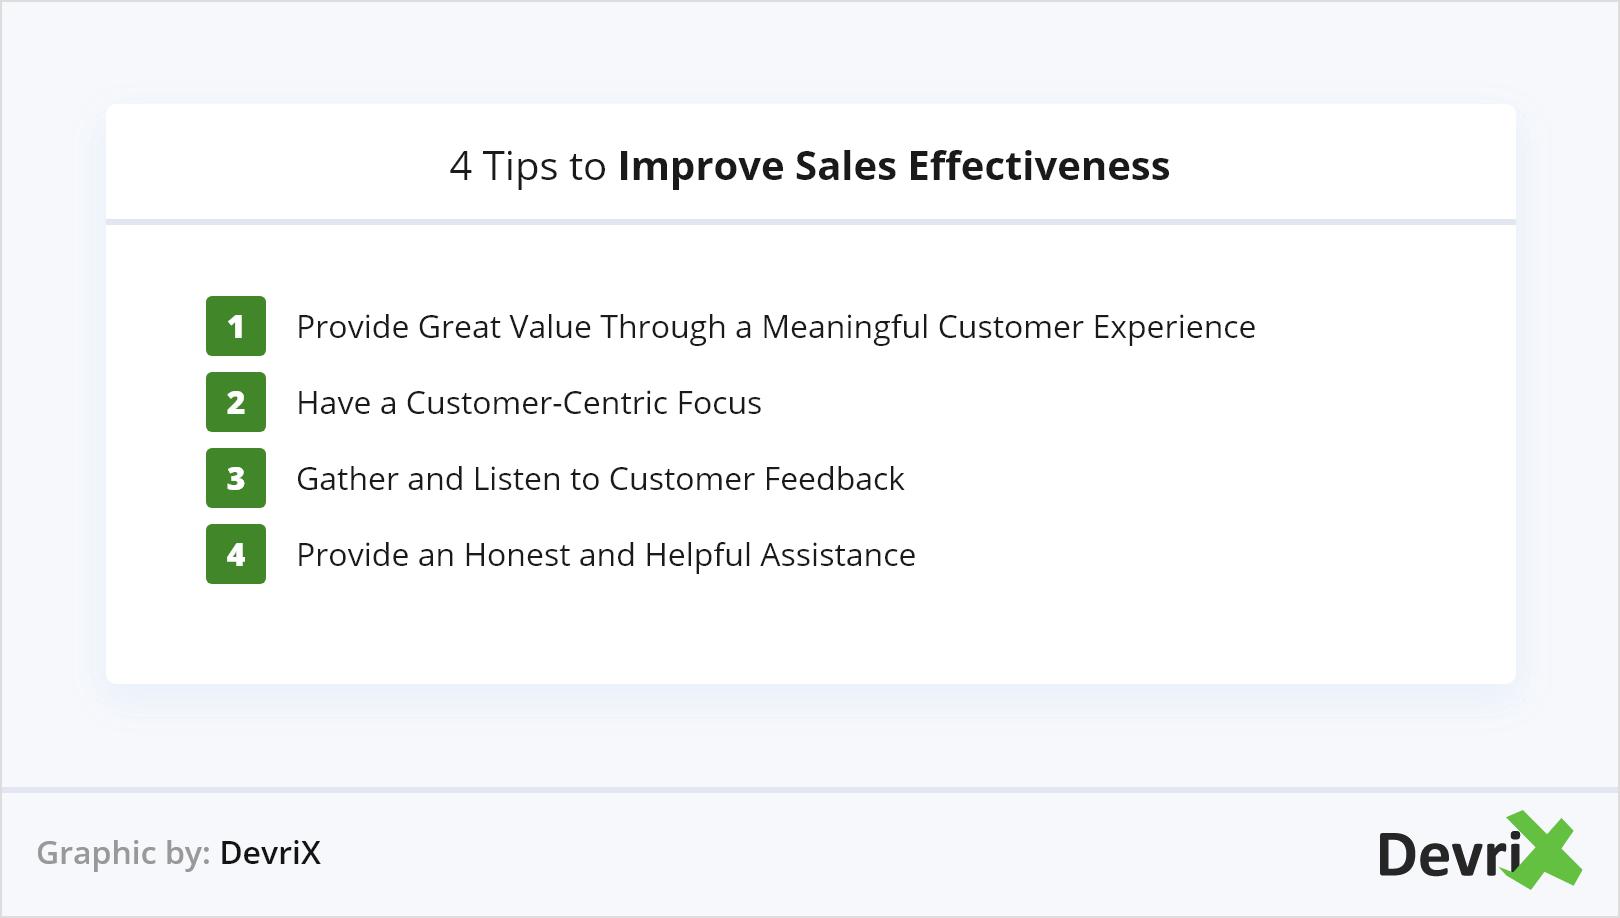 4 Tips to Improve Sales Effectiveness